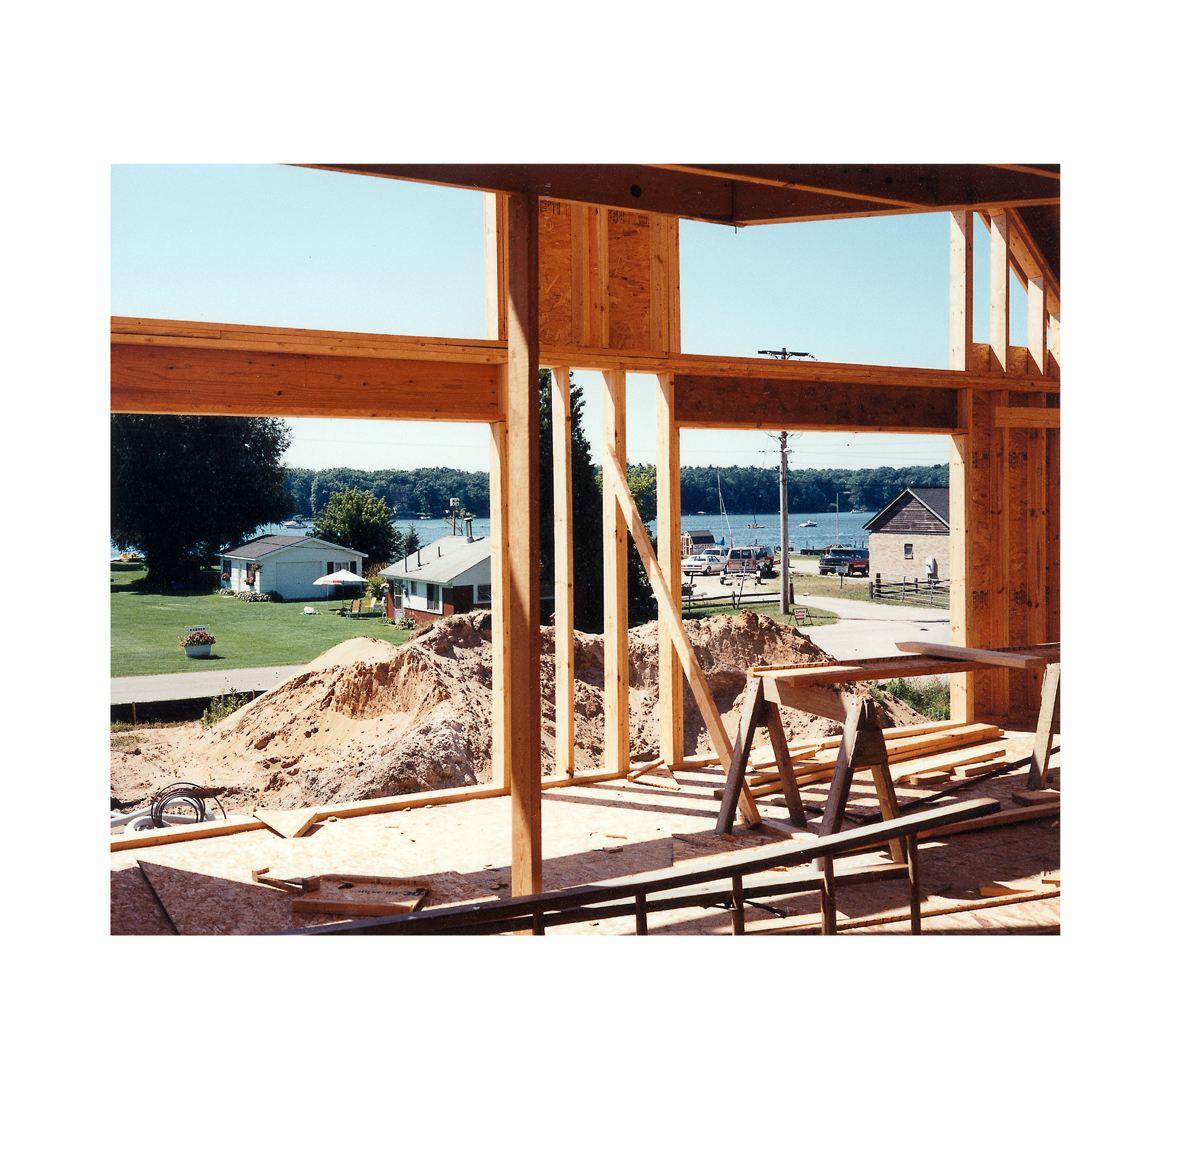 """House under Construction"" | Village Portrait | Pentwater, Michigan, USA | 1996"